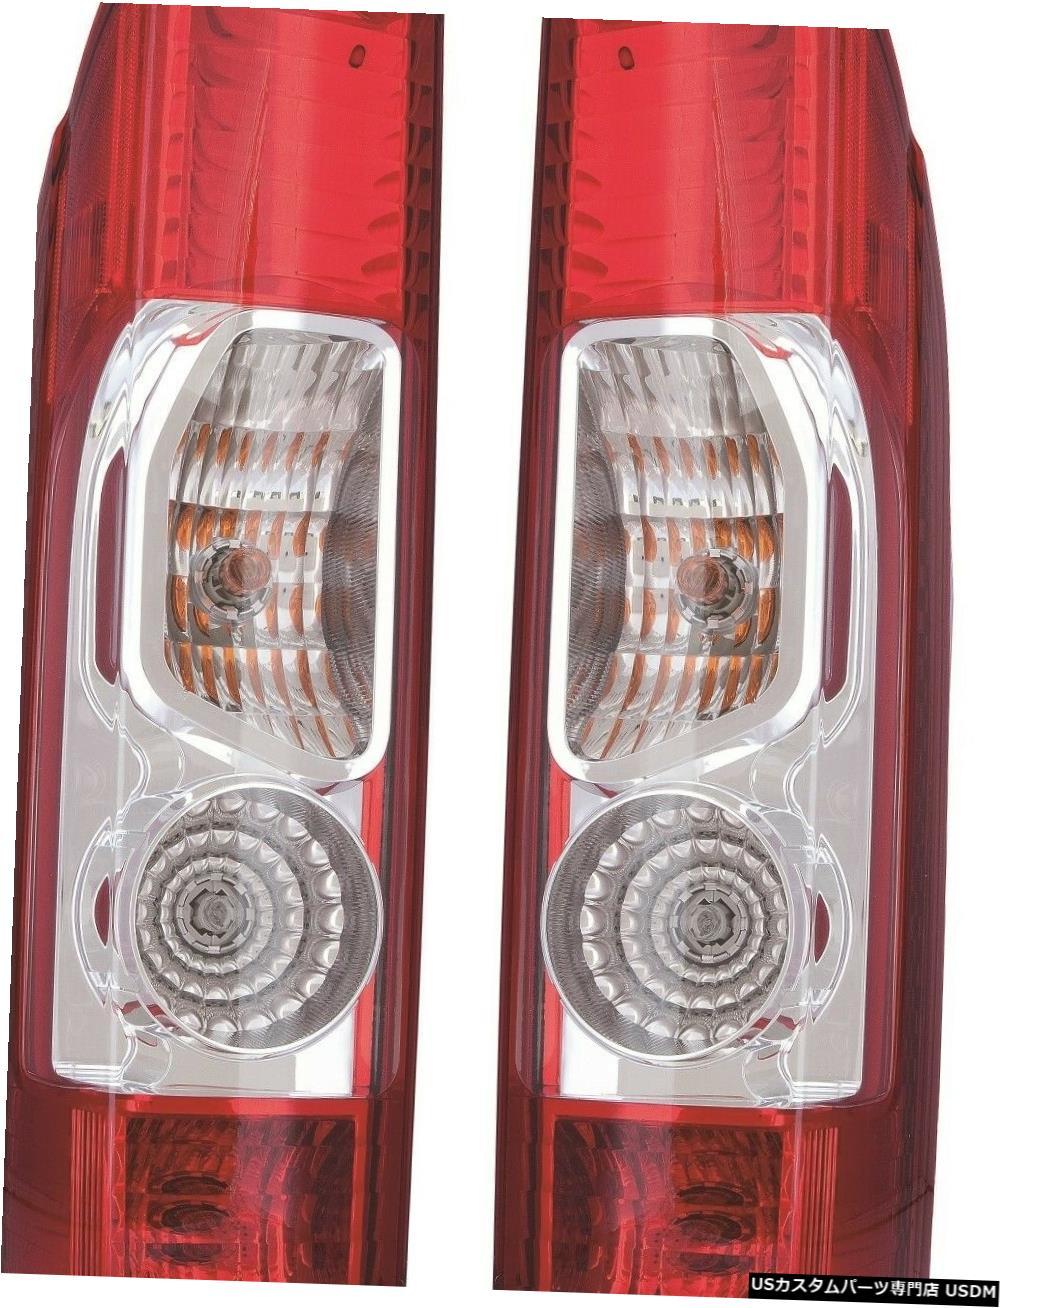 Tail light RAM PROMASTER VAN 2014-2019 RIGHT LEFT TAILLIGHTS TAIL LIGHTS REAR LAMPS PAIR RAM PROMASTER VAN 2014-2019 RIGHT LEFT TAILLIGHTS TAIL LIGHTS REAR LAMPS PAIR